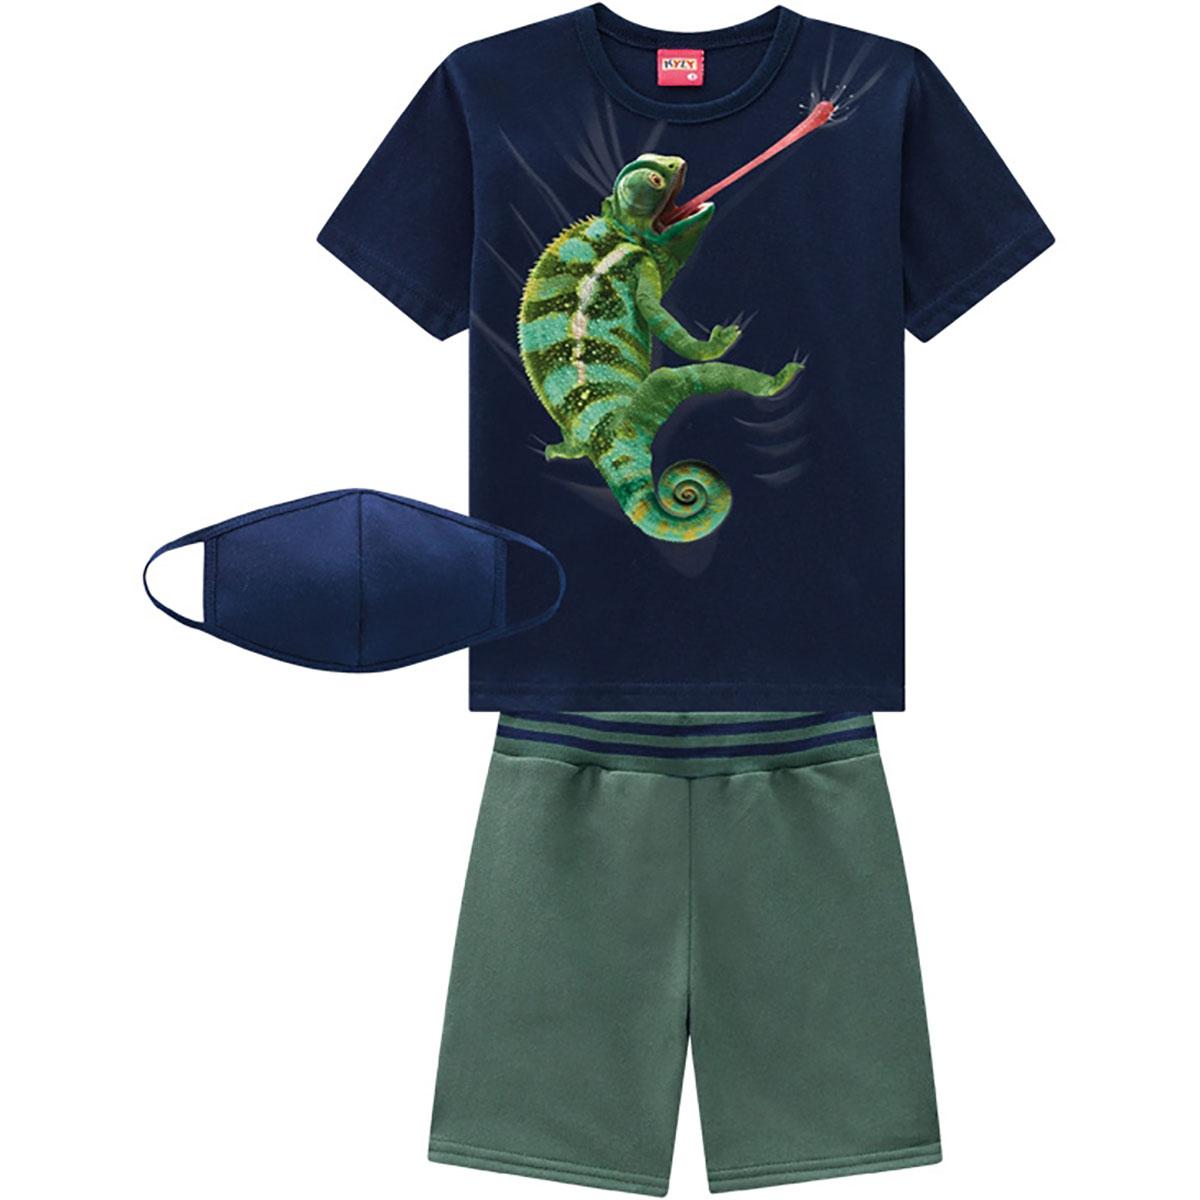 kit de Conjuntos Kyly + Milon Masculino Infantil